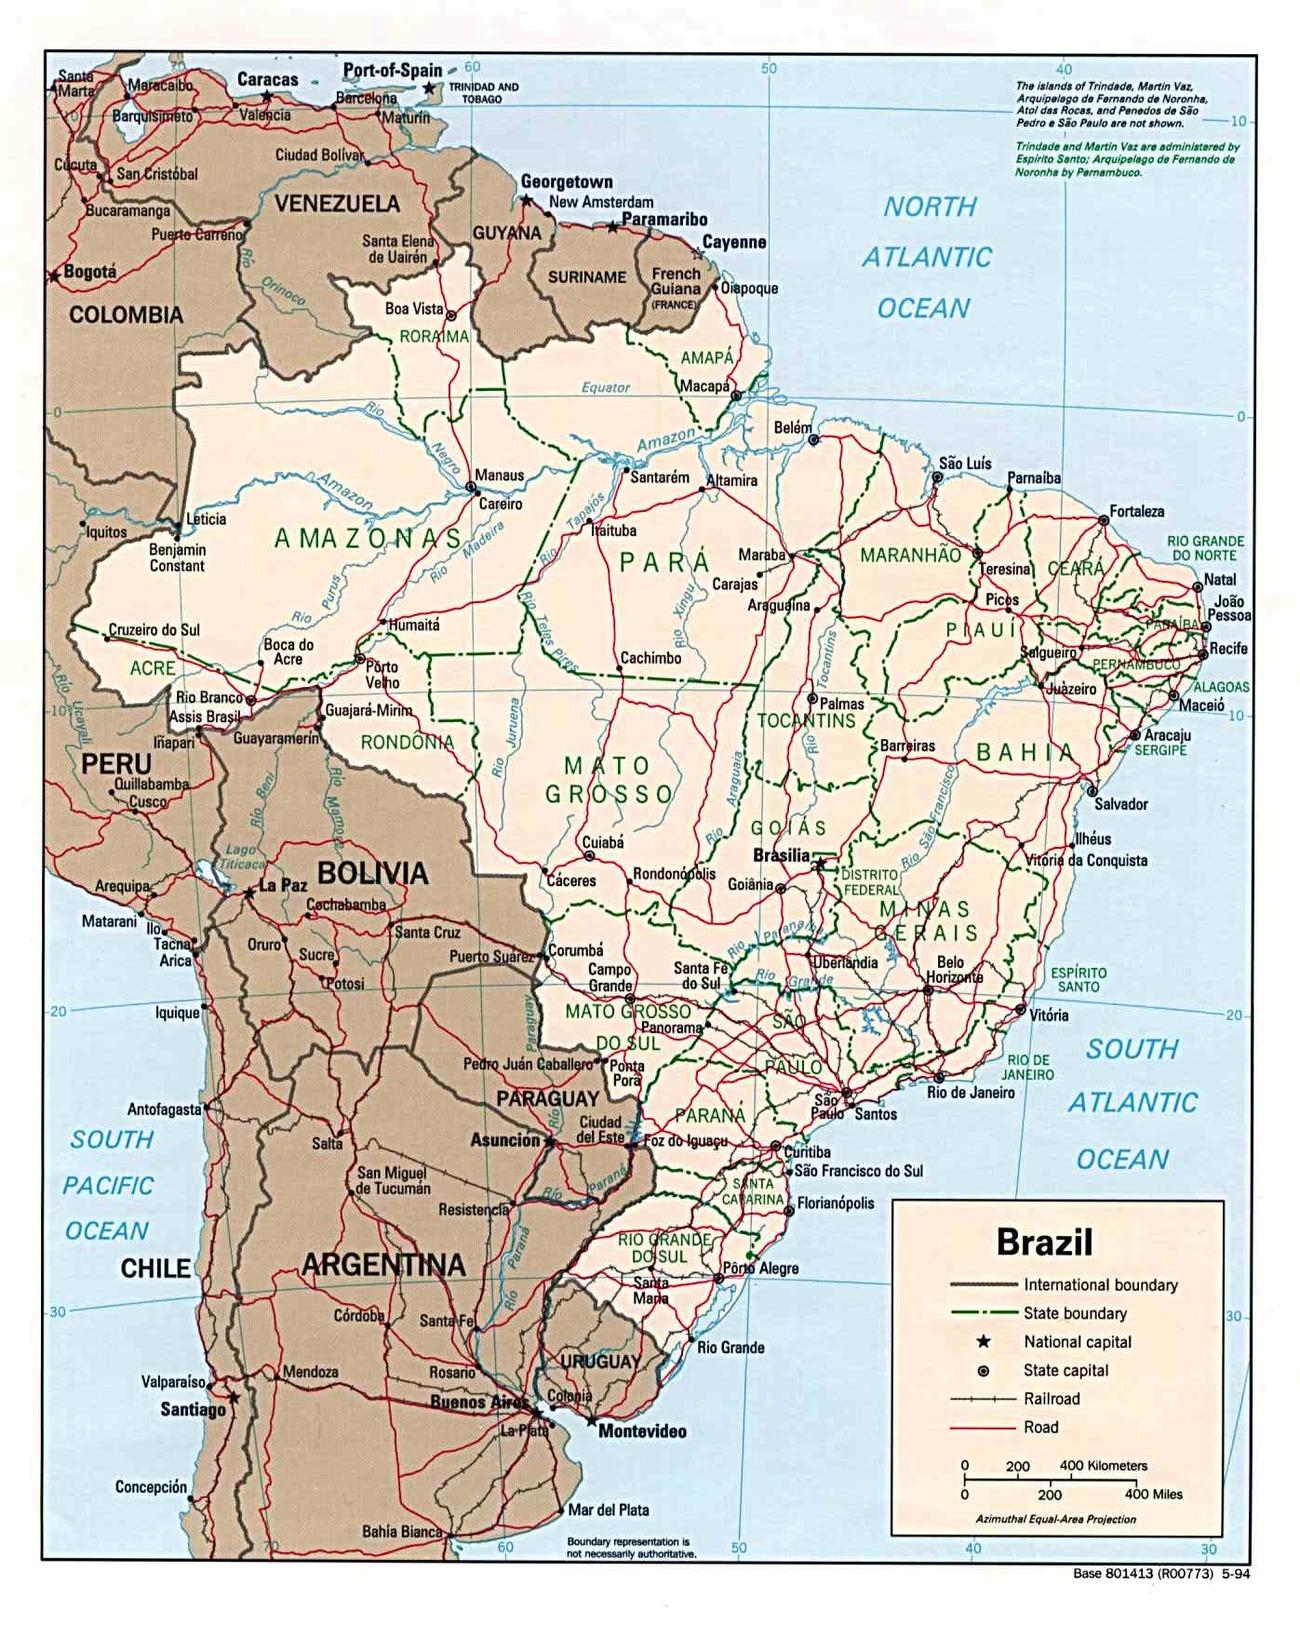 America Politica Cartina.Maxim De Exemplu Banzai Mappa America Meridionale Amazon Confettidarling Com